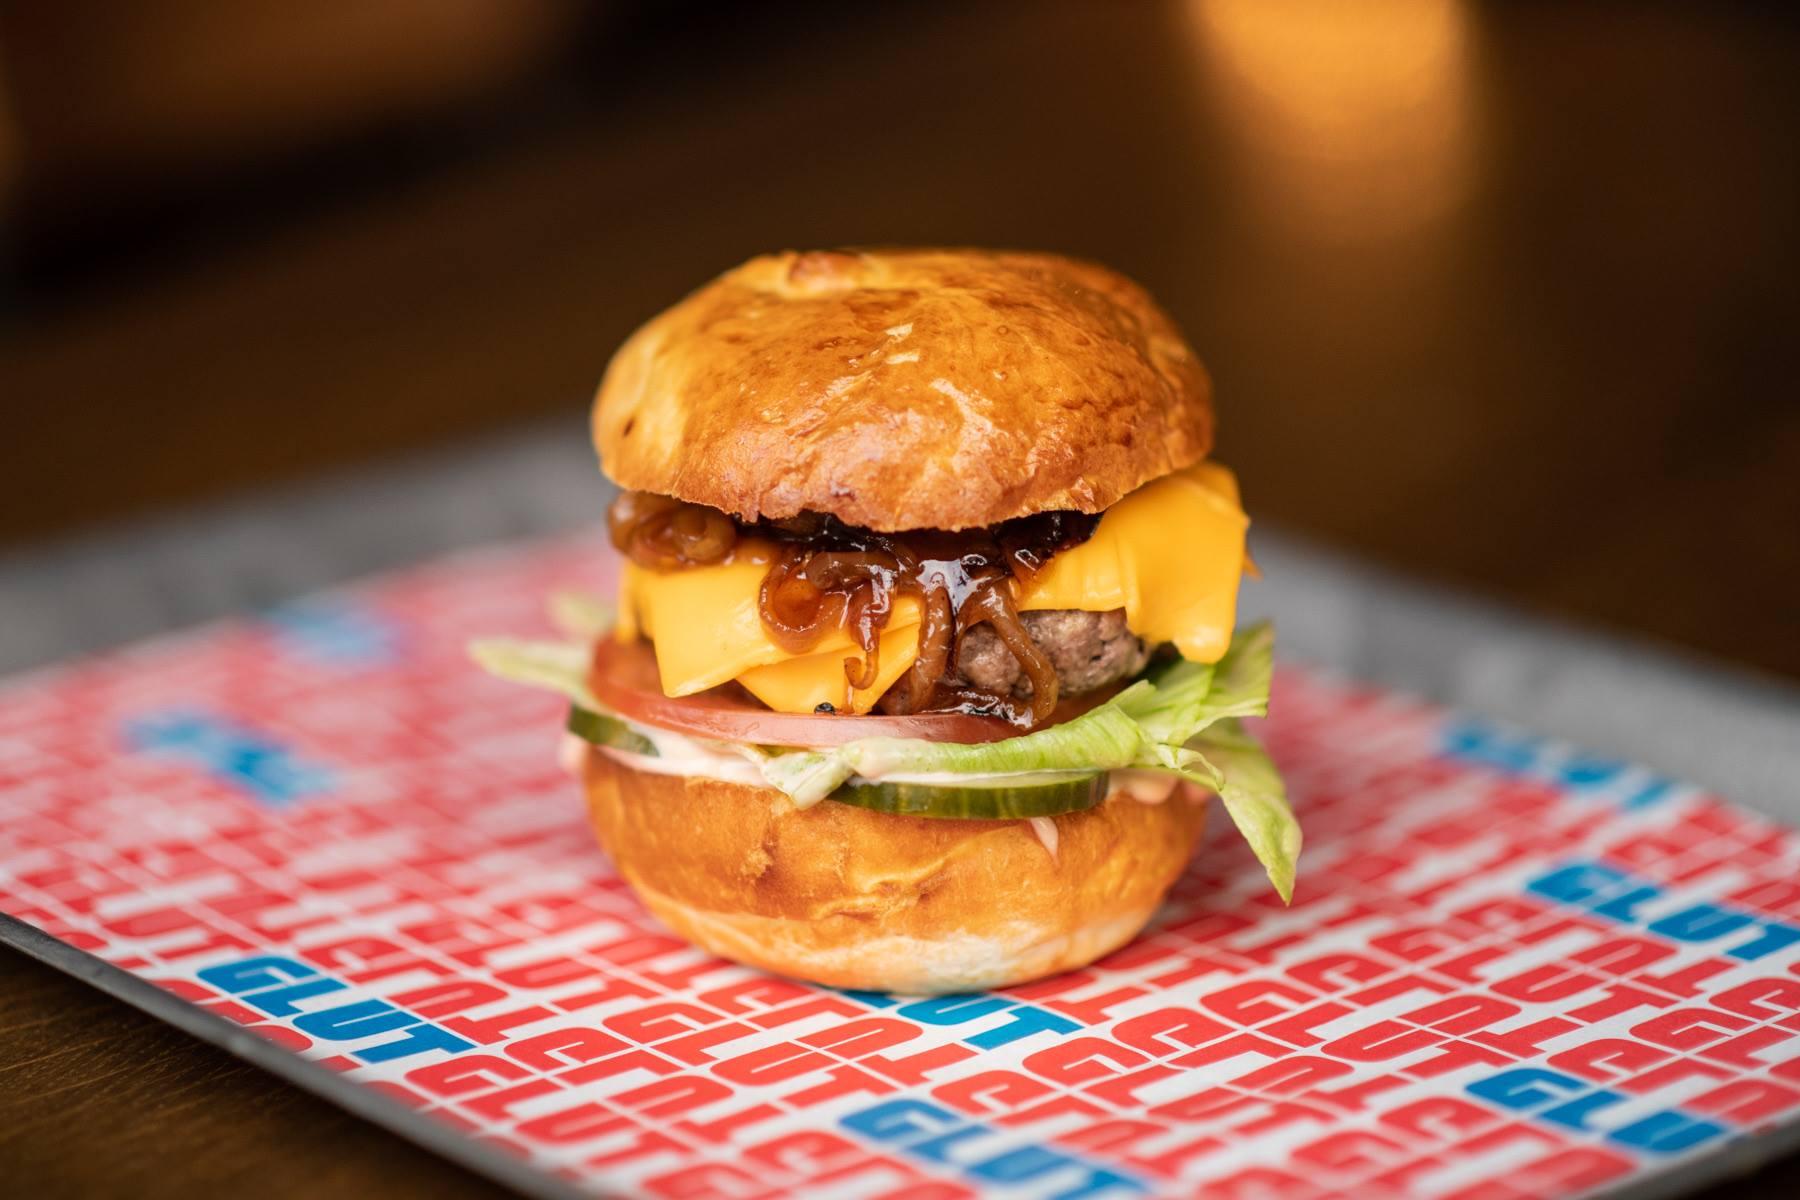 Glut, Oxford - Burger Restaurant - Gallery Image 05